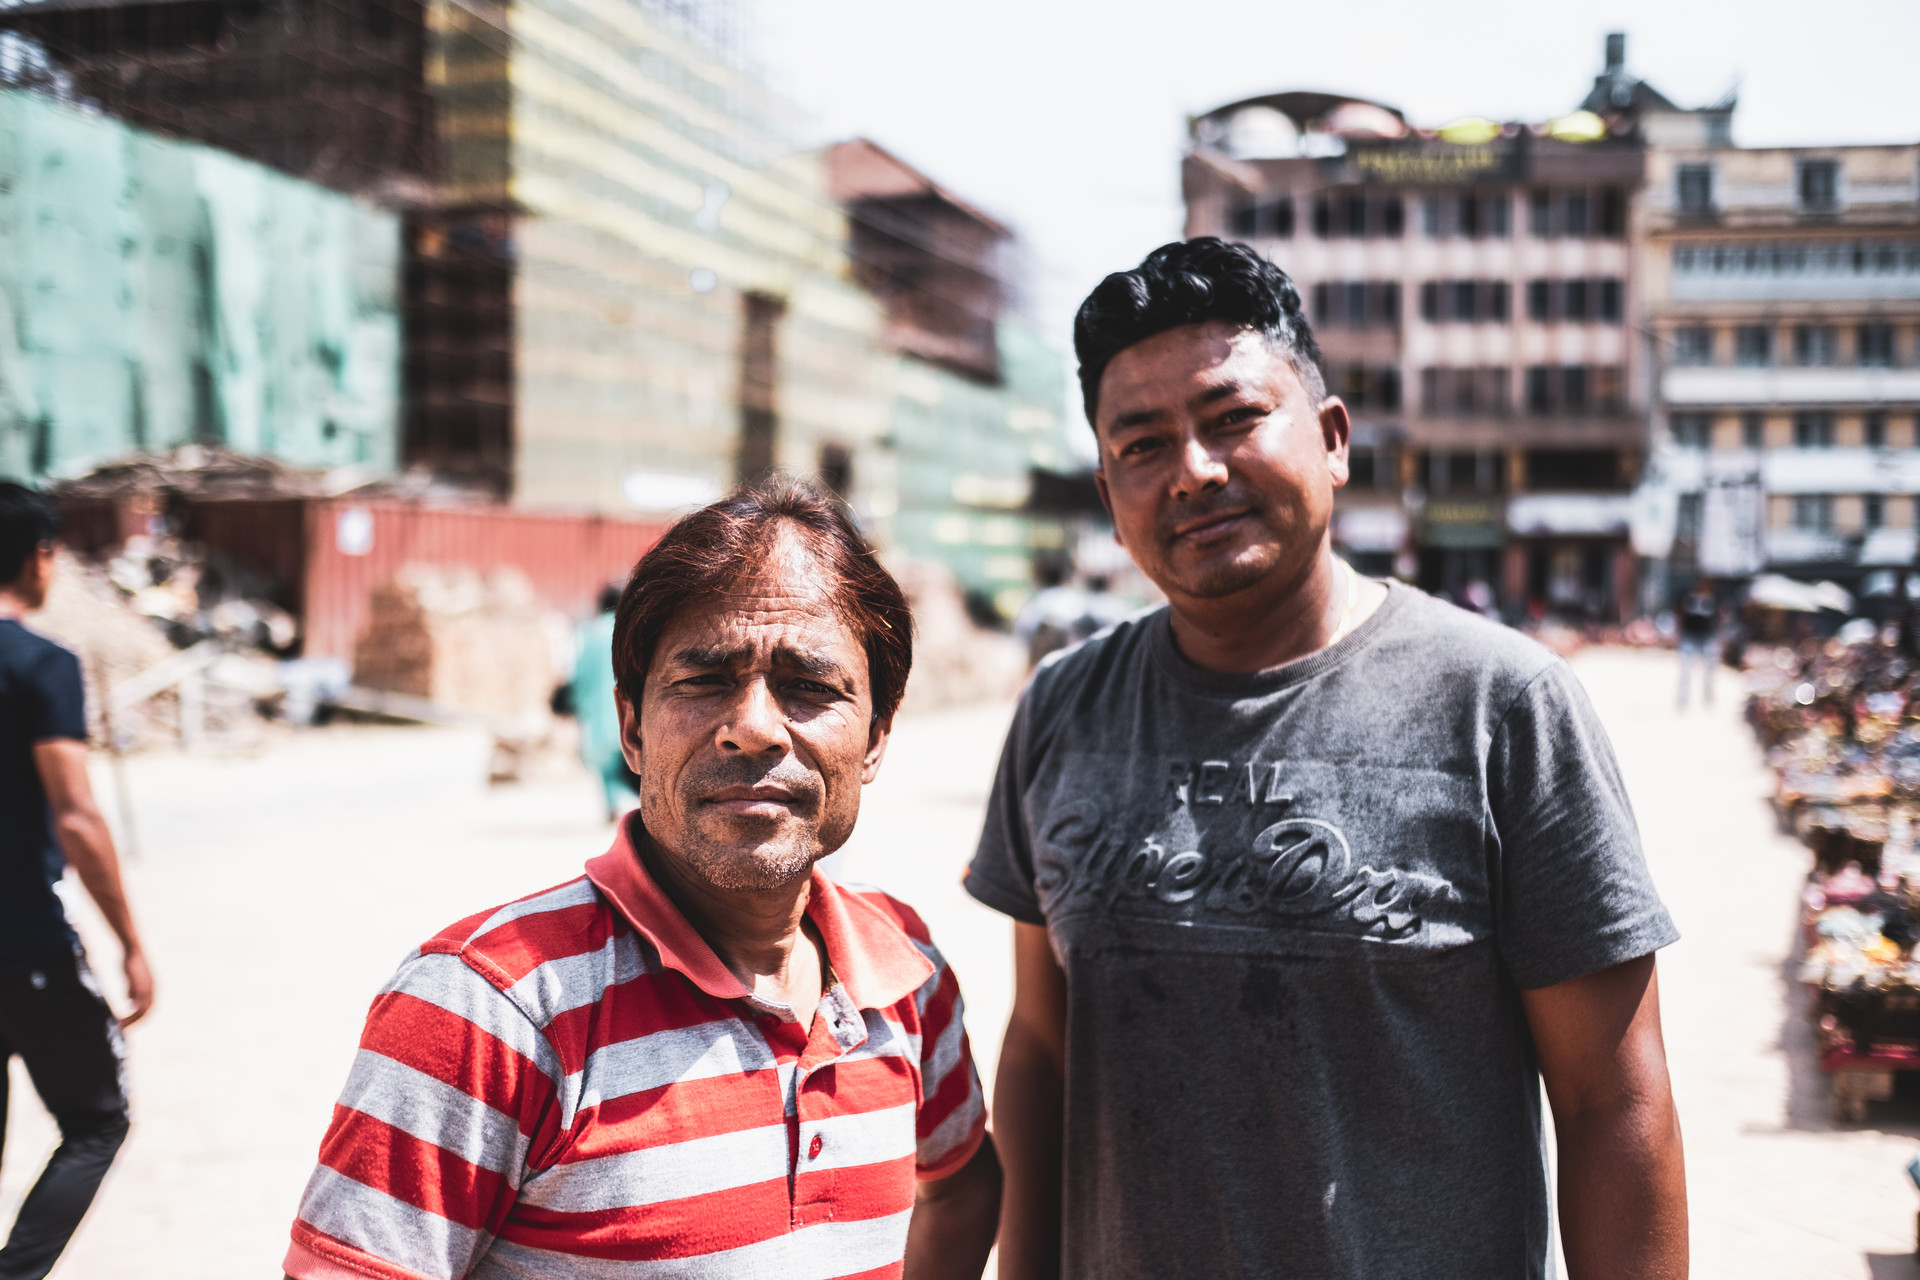 nepal_port-119322.jpg